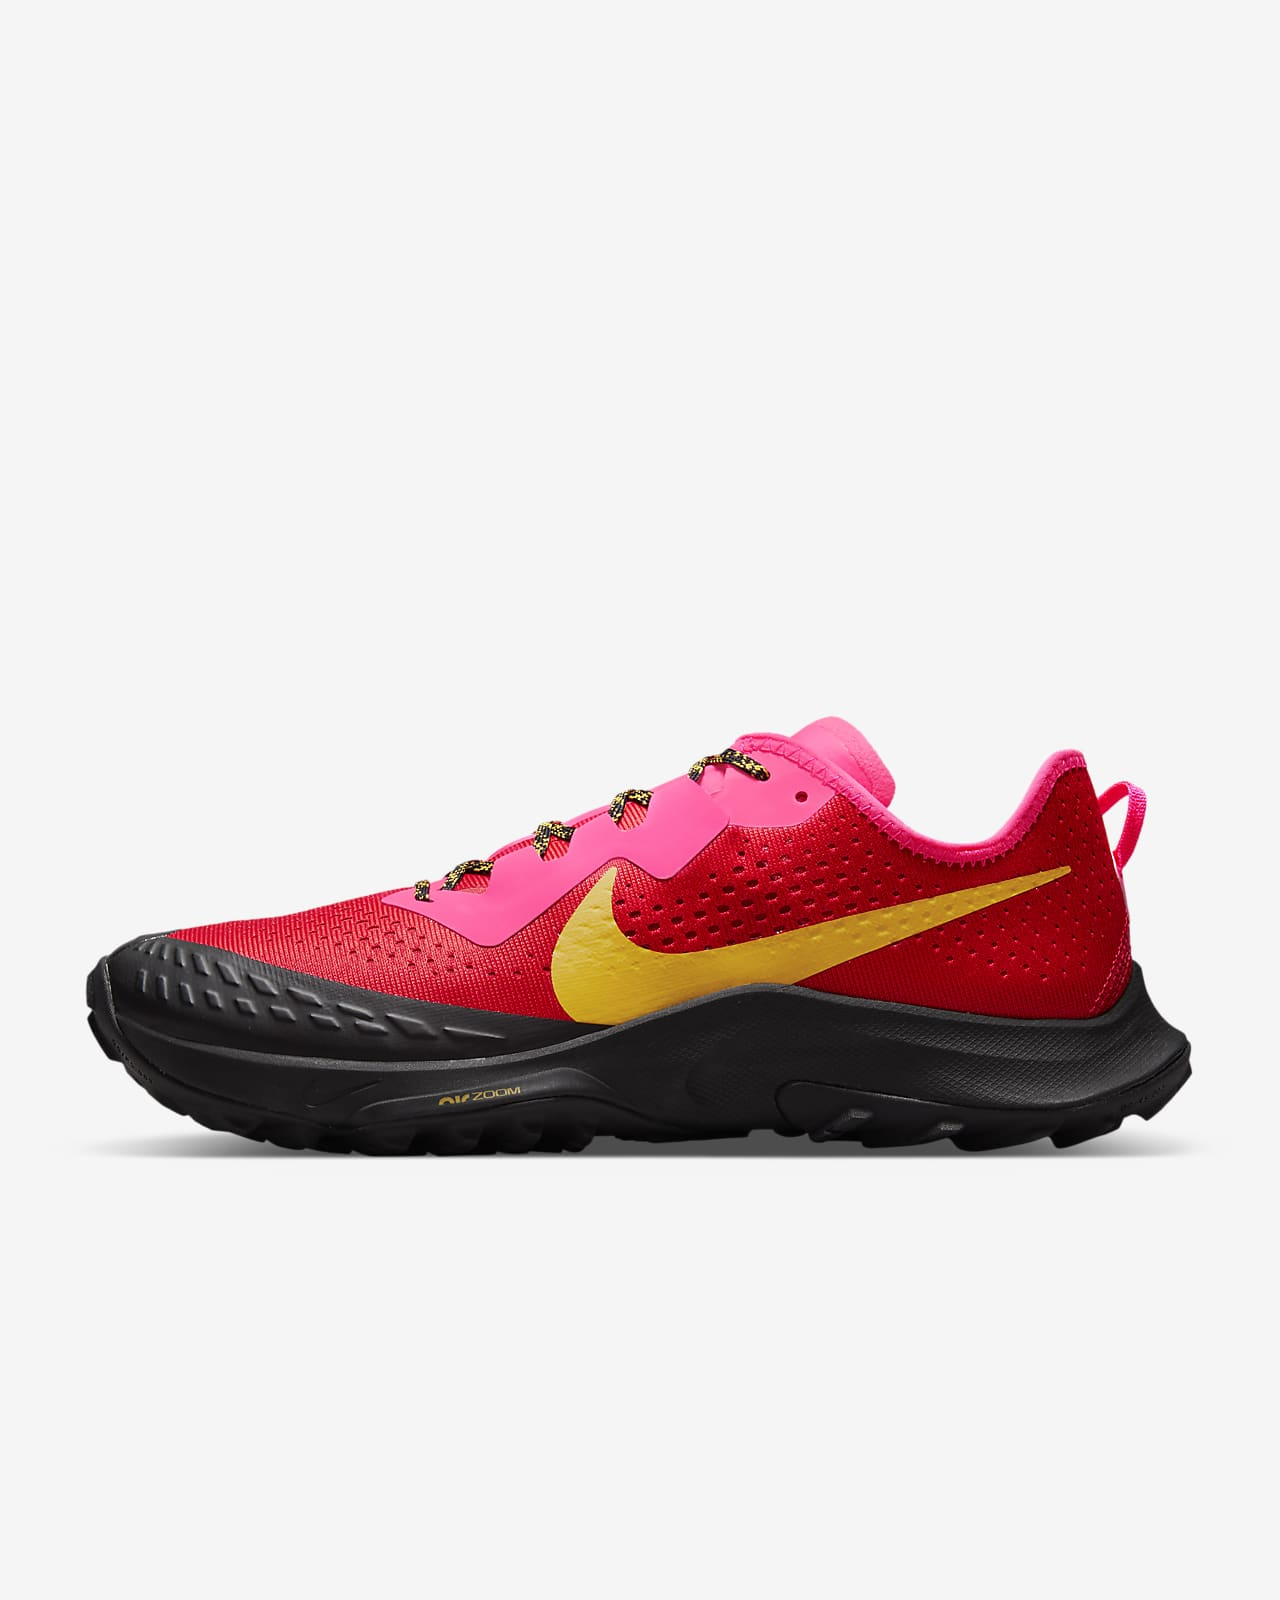 Calzado de trail running Nike Air Zoom Terra Kiger 7 para hombre